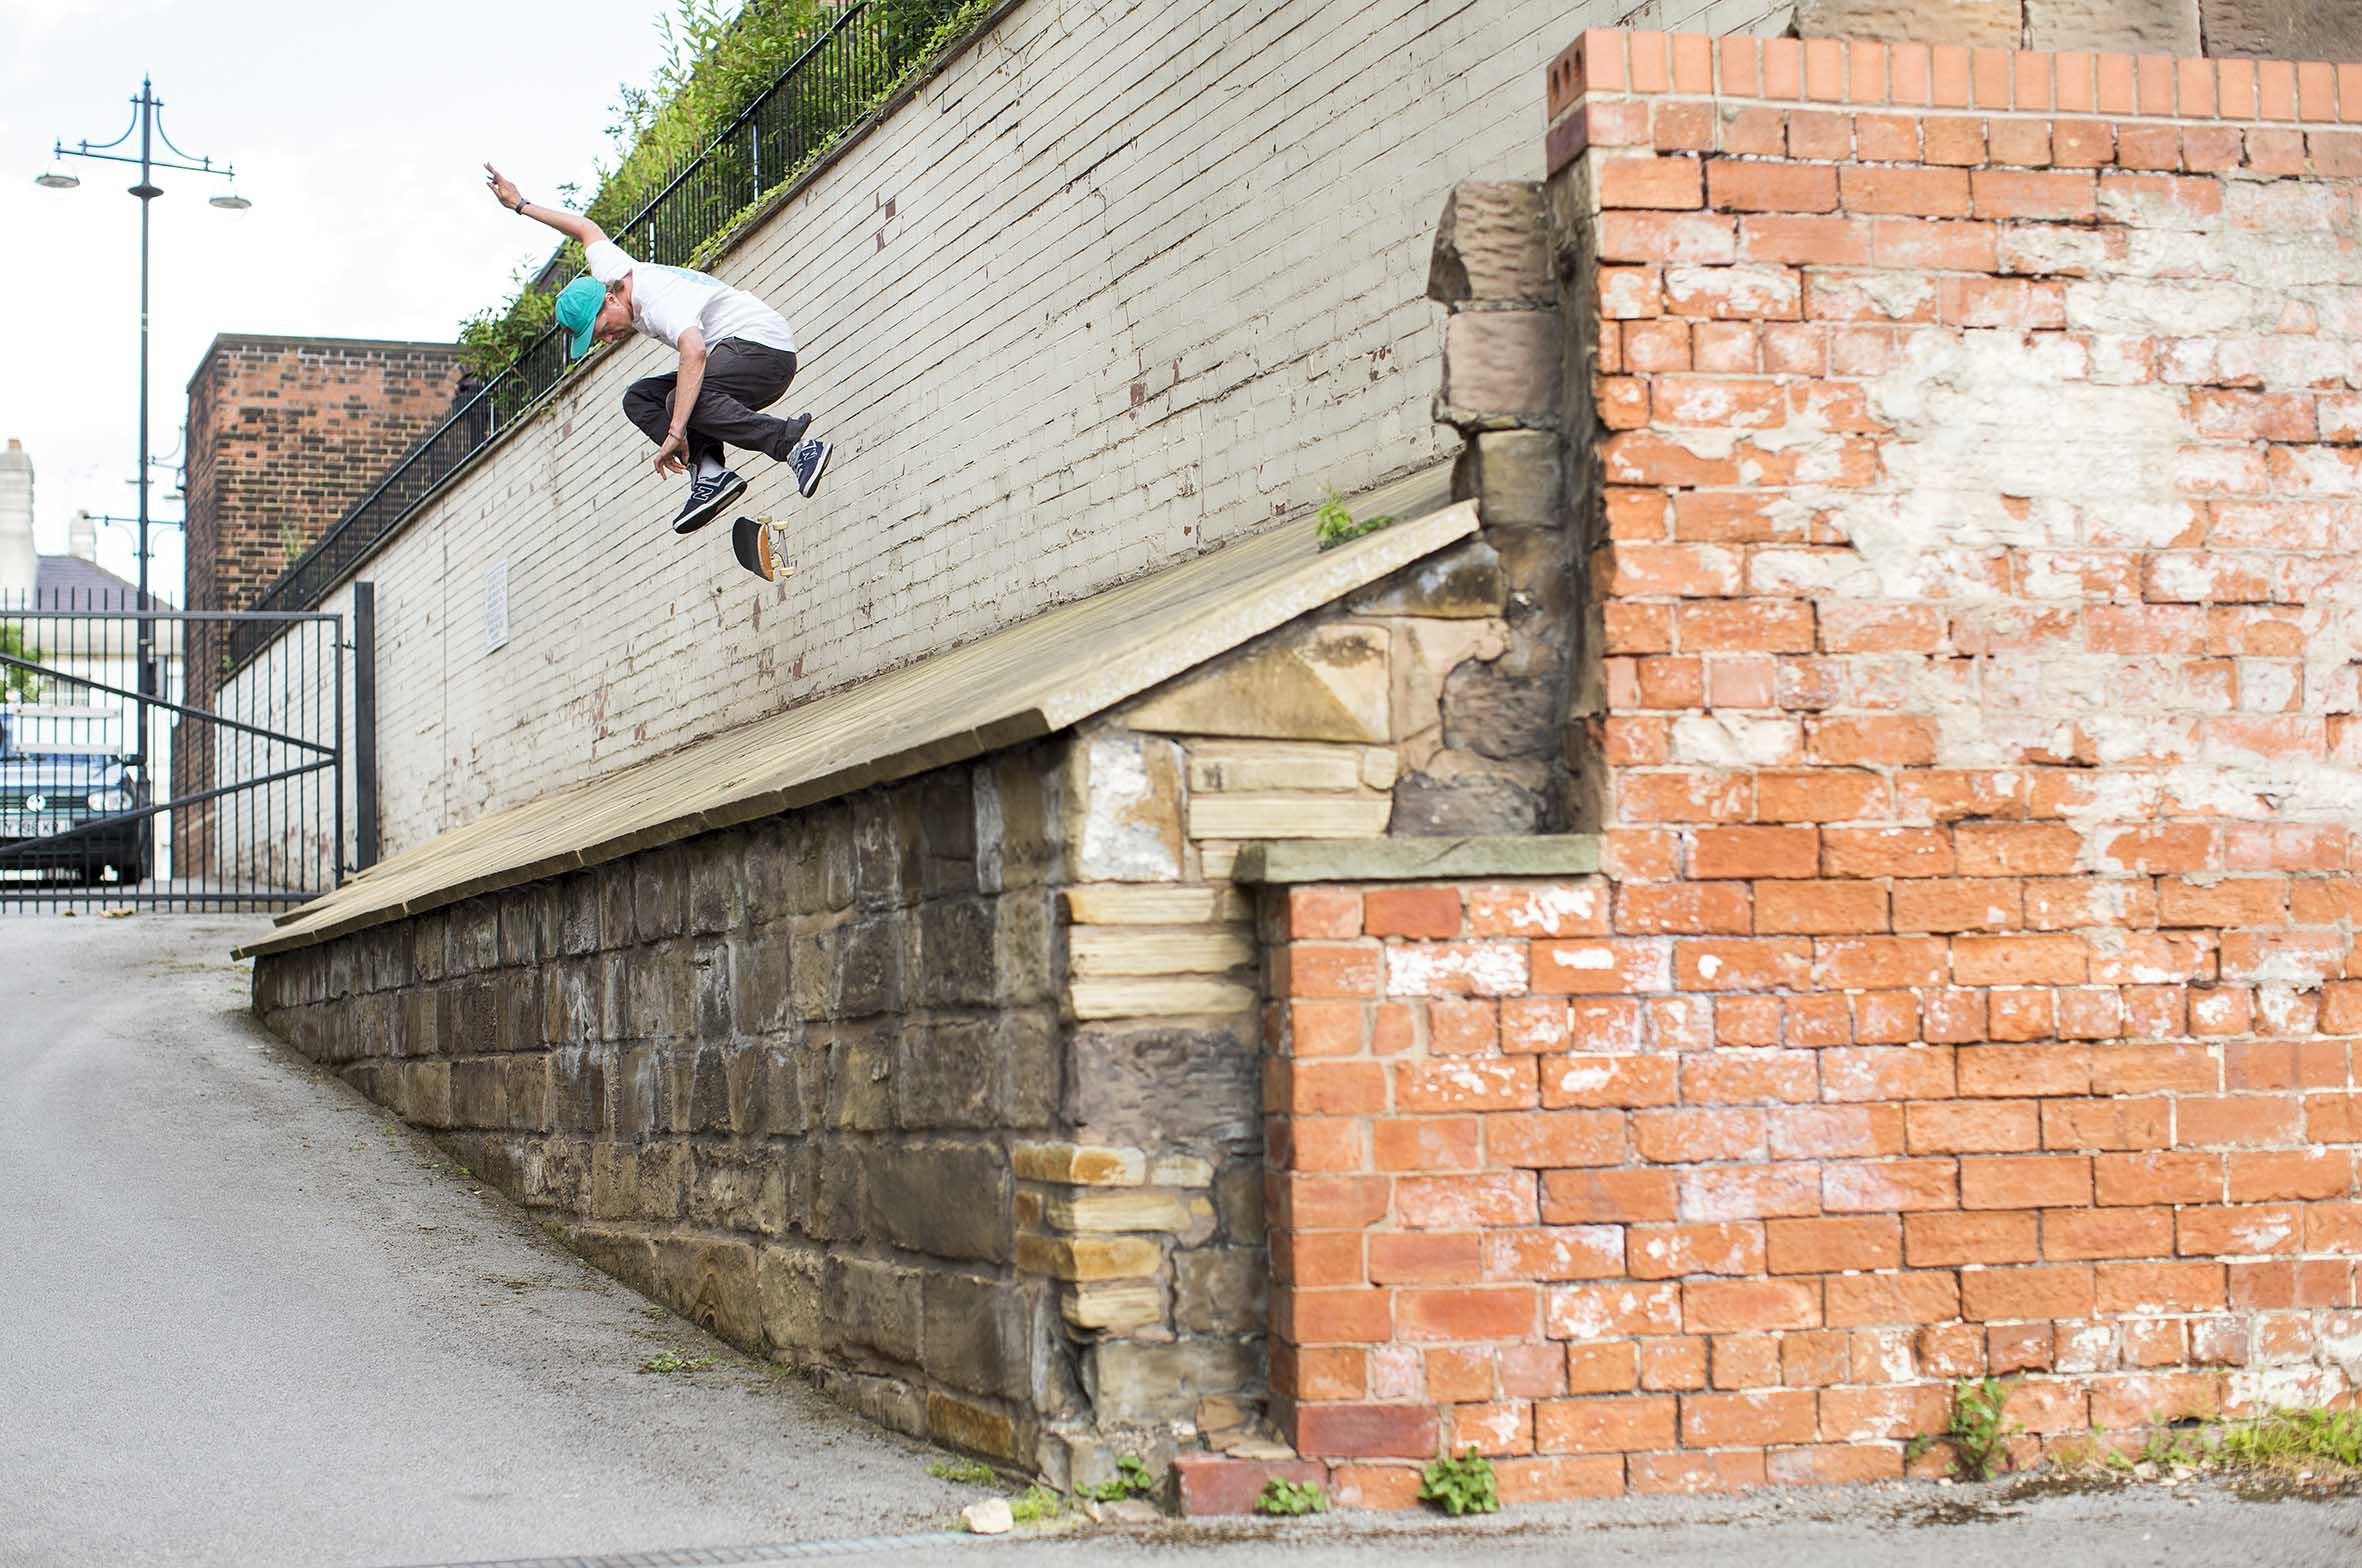 Mark Baines - switch backside flip